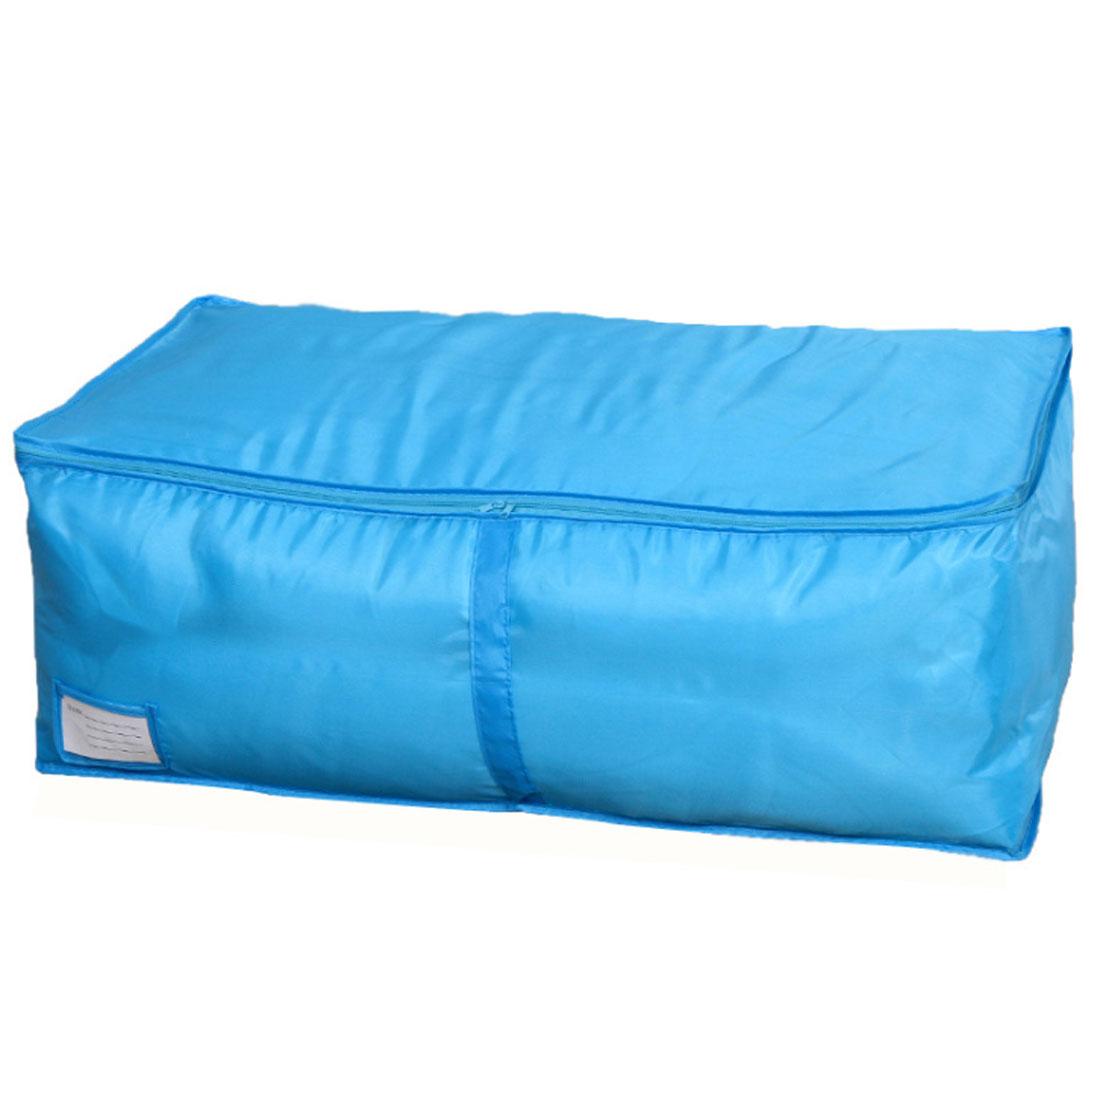 Home Nylon Quilt Bedquilt Down Jacket Storage Tote Bag Organizer Container Blue